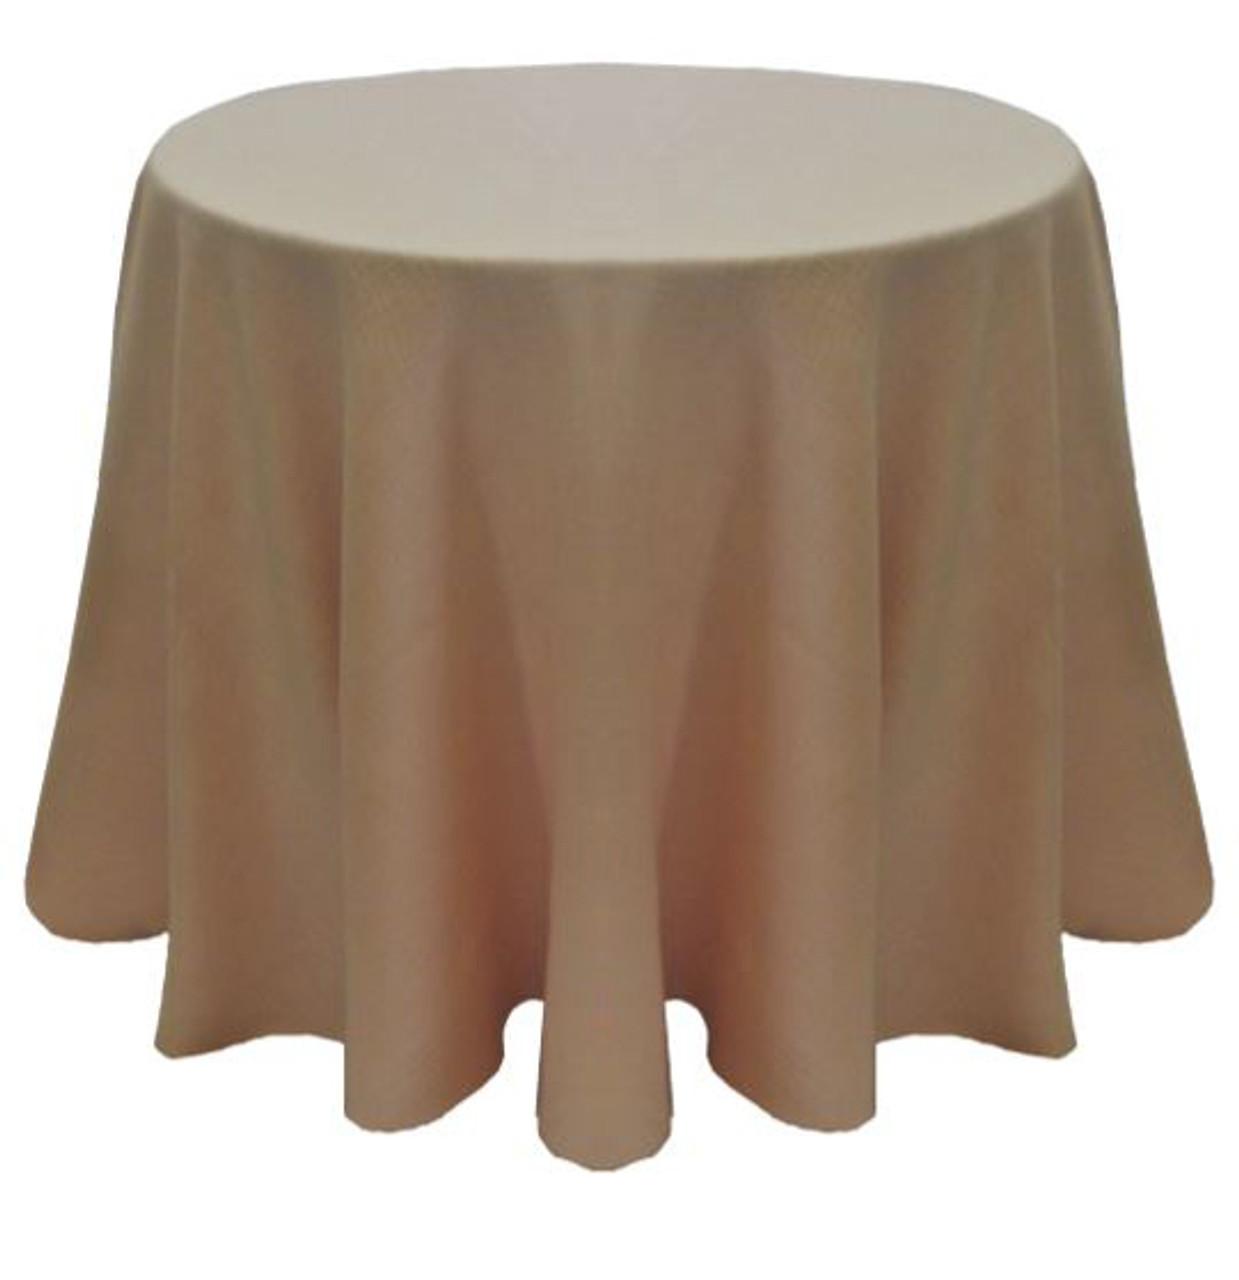 Merveilleux ... Panama Rustic Textured Tablecloth Linen Light Pink ...